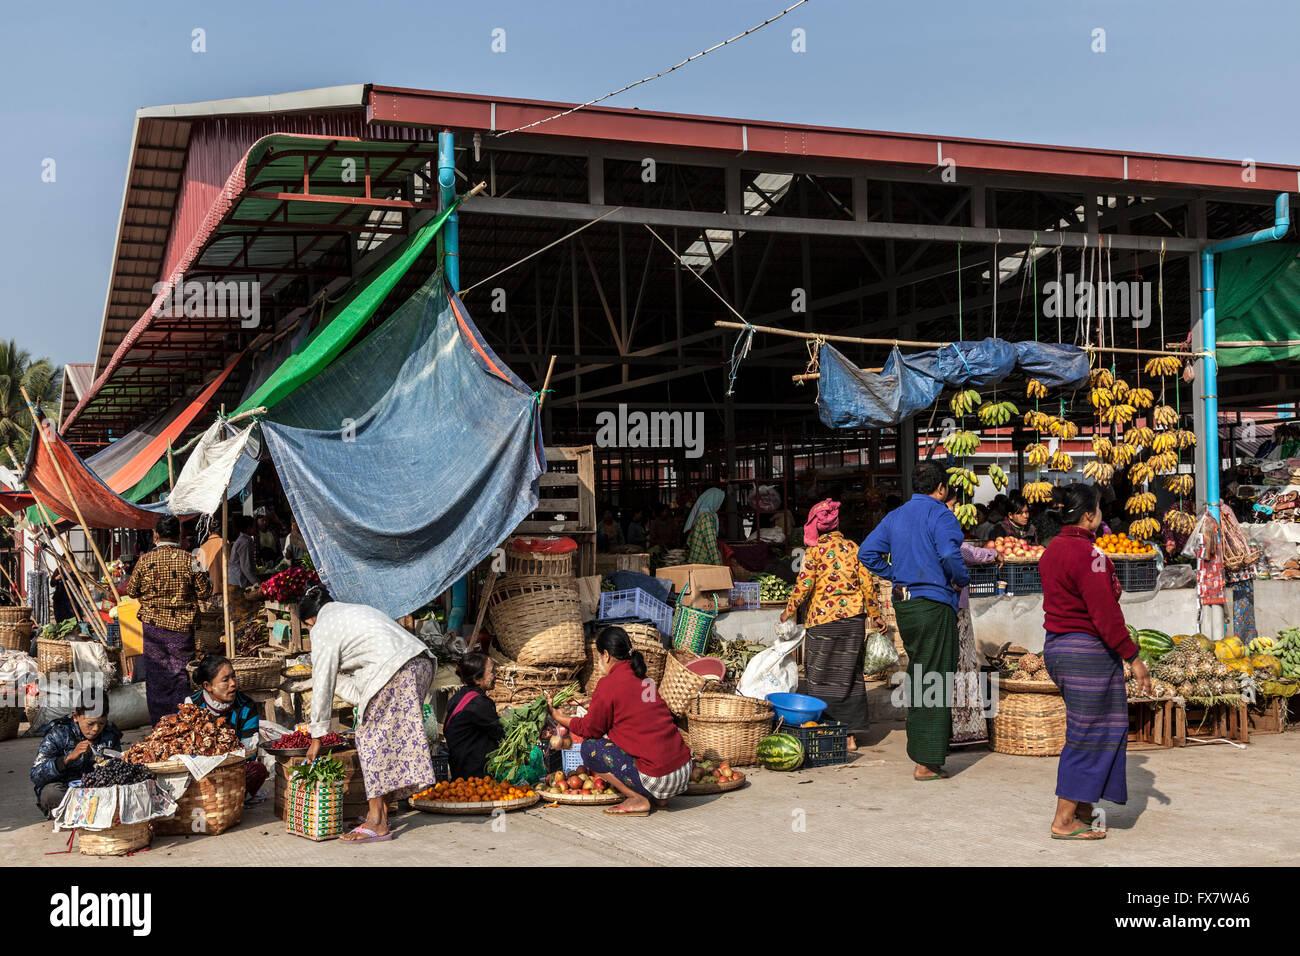 The New Bagan covered market (Myanmar). Le marché couvert de New Bagan (Birmanie). - Stock Image